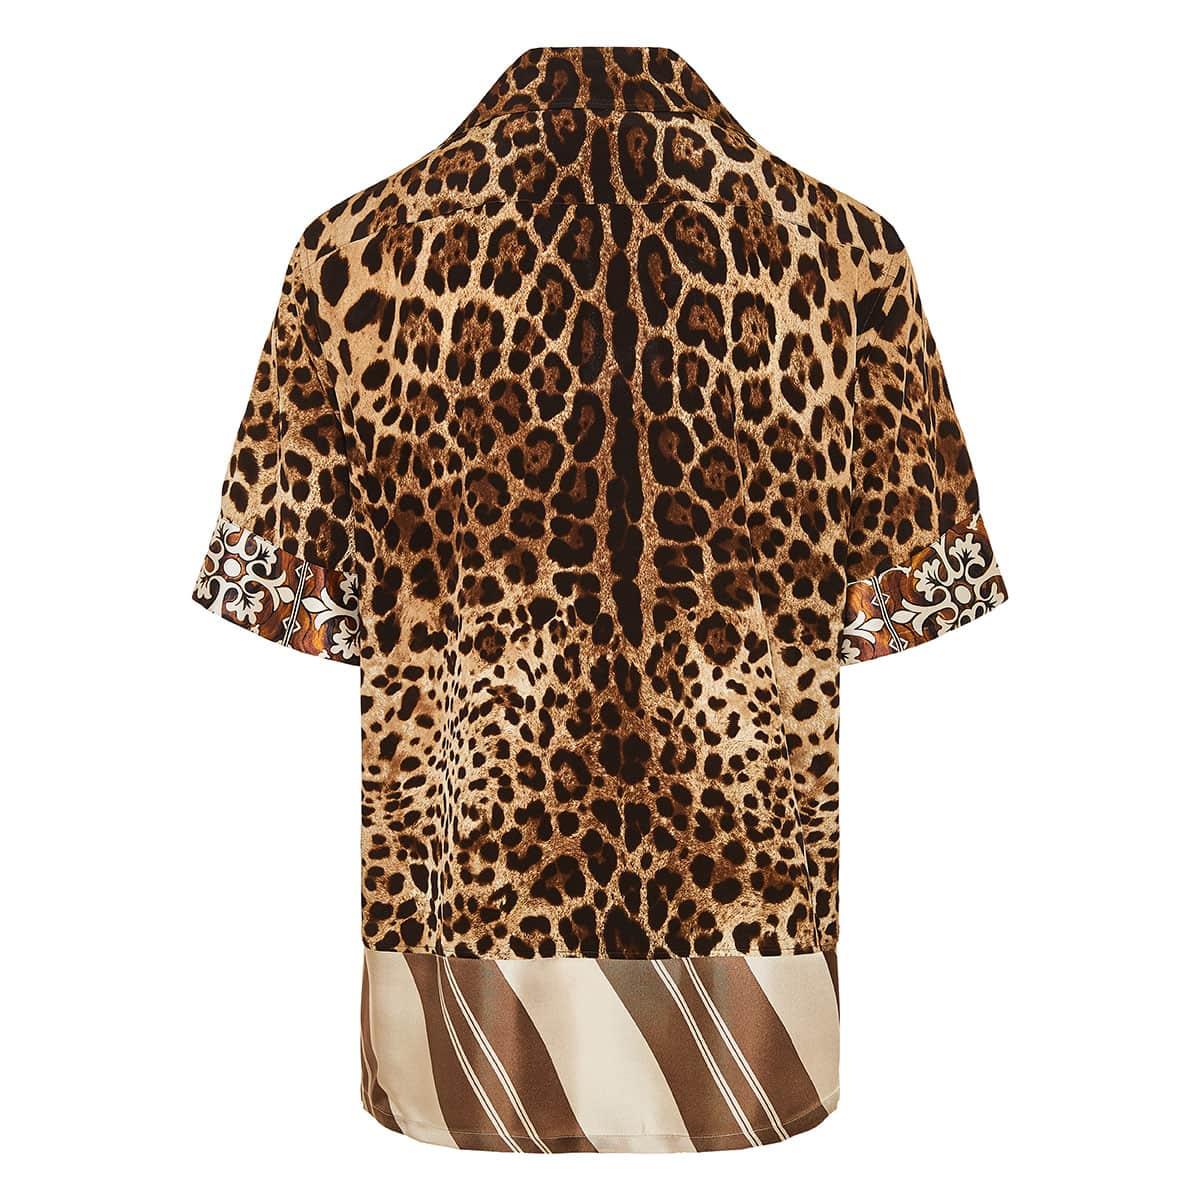 Leopard oversized short-sleeved shirt